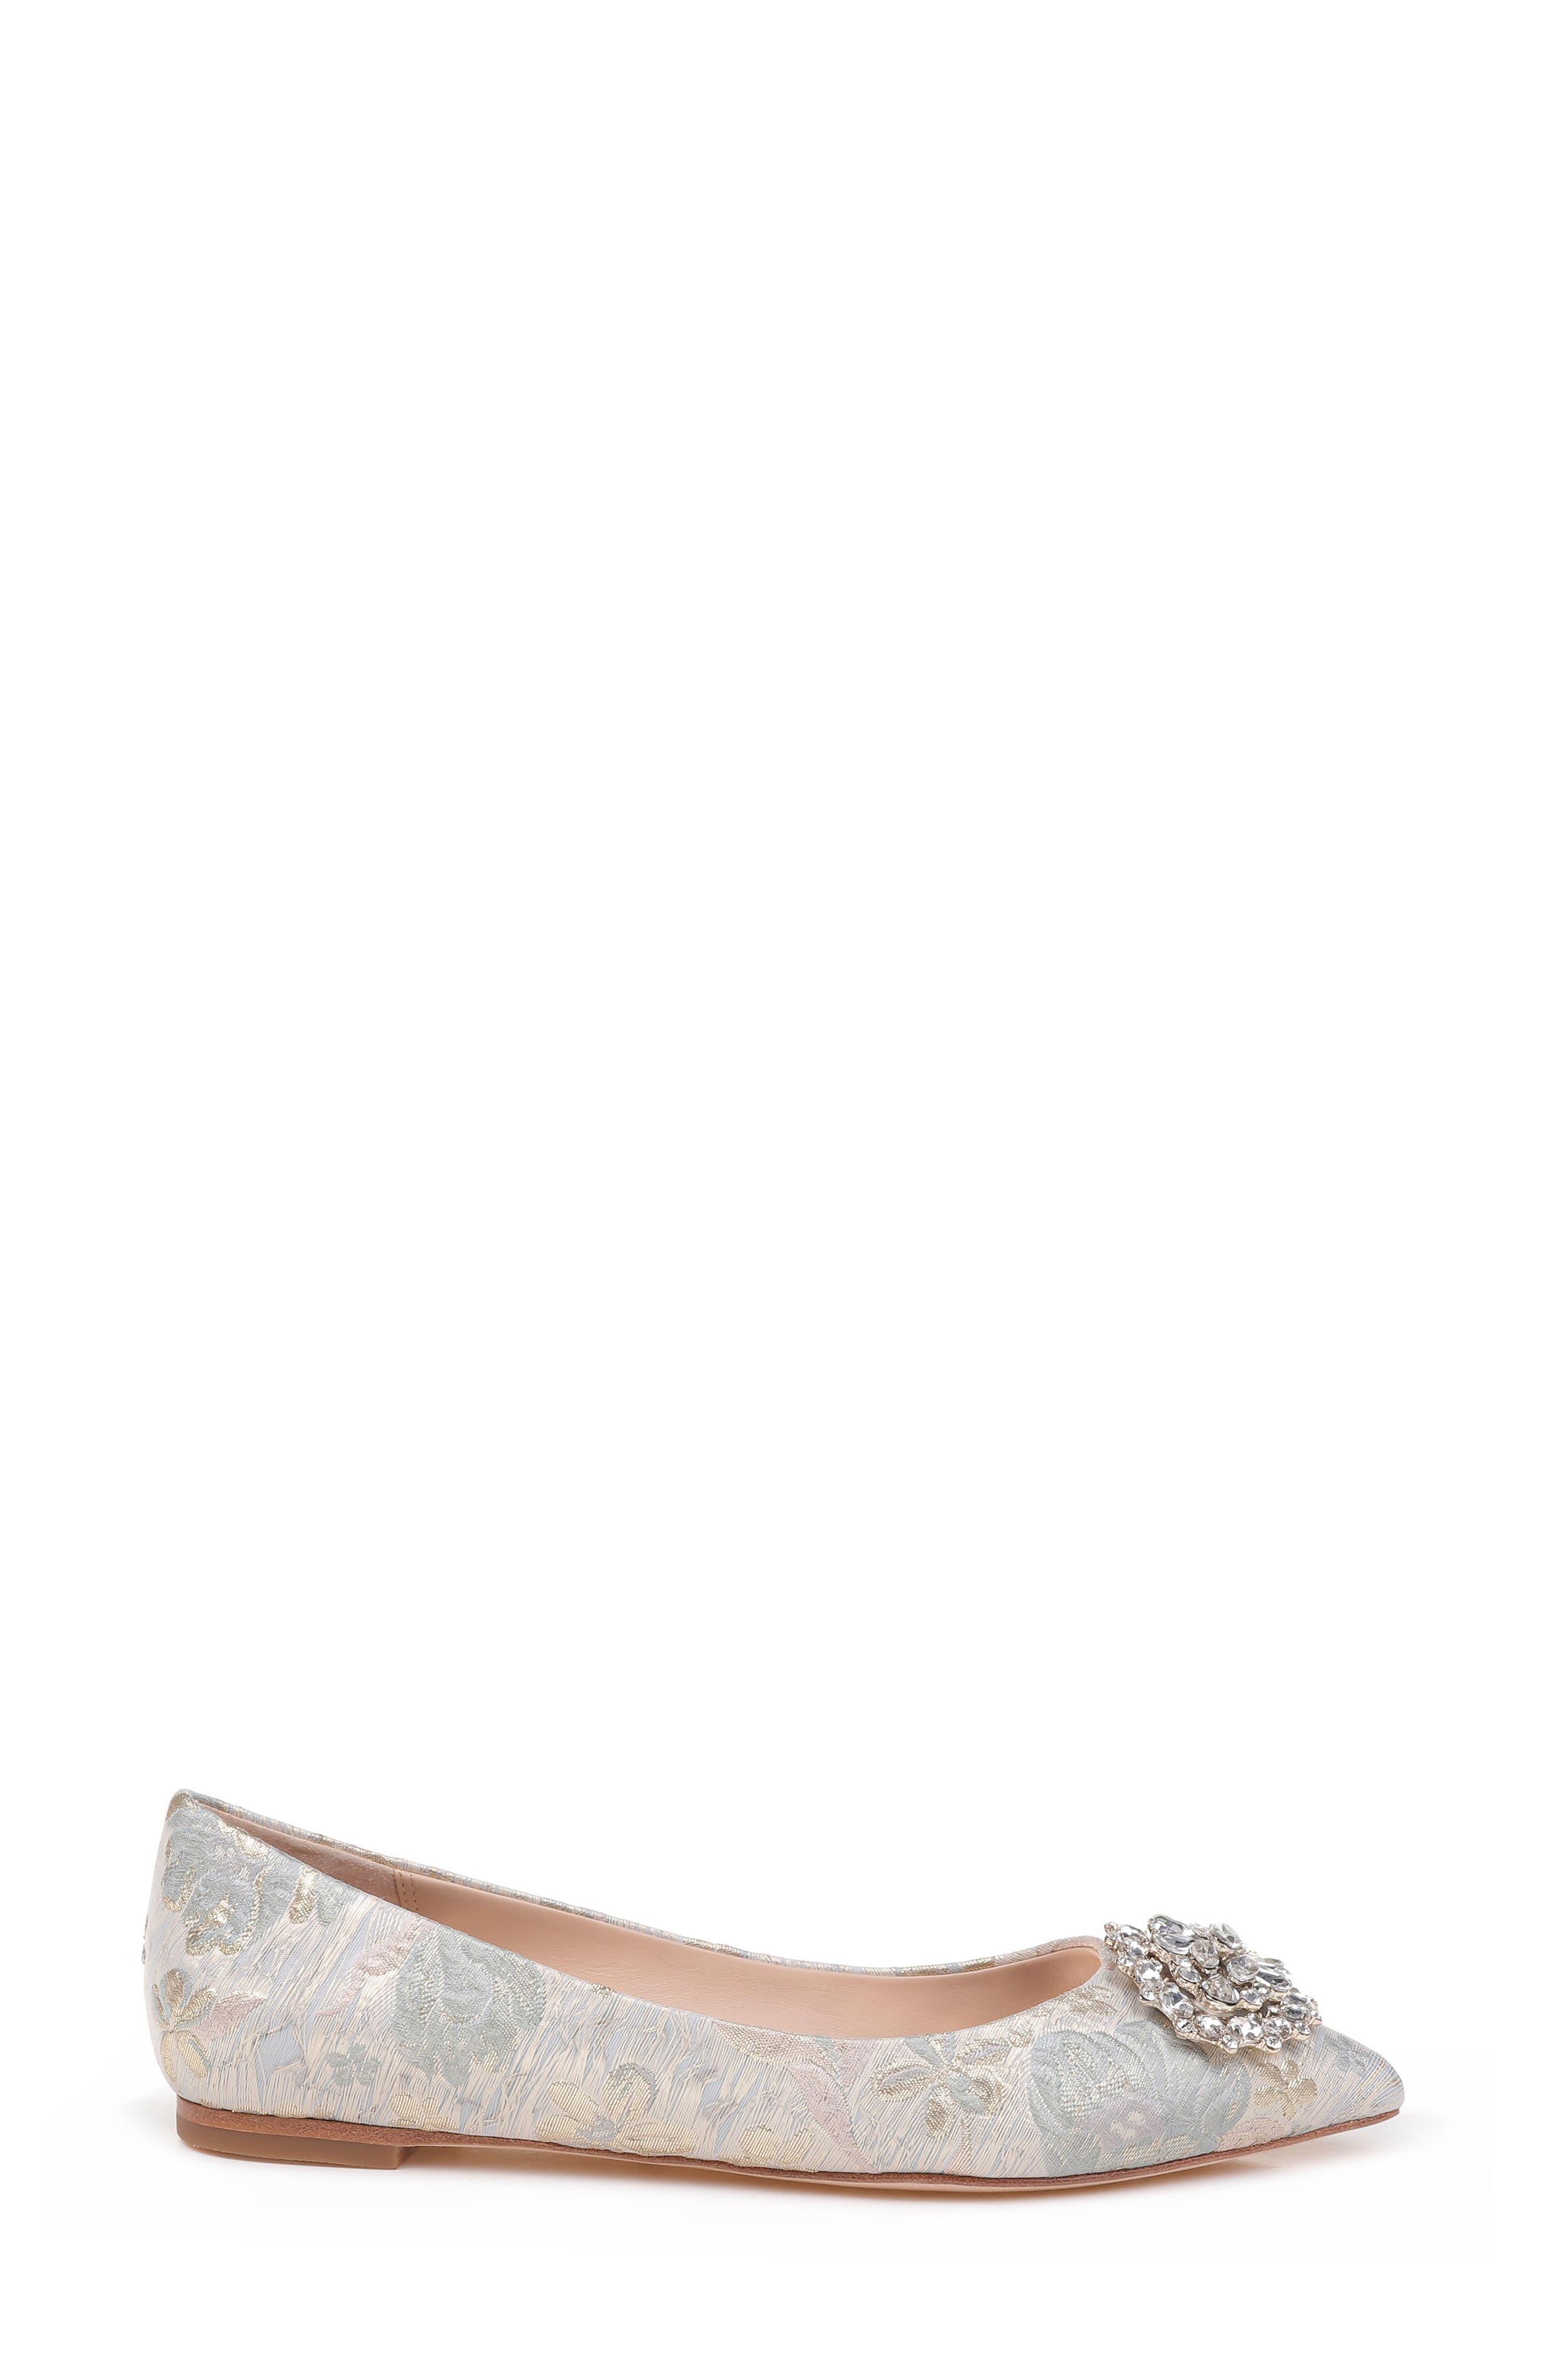 'Davis' Crystal Embellished Pointy Toe Flat,                             Alternate thumbnail 3, color,                             Platino Brocade Fabric